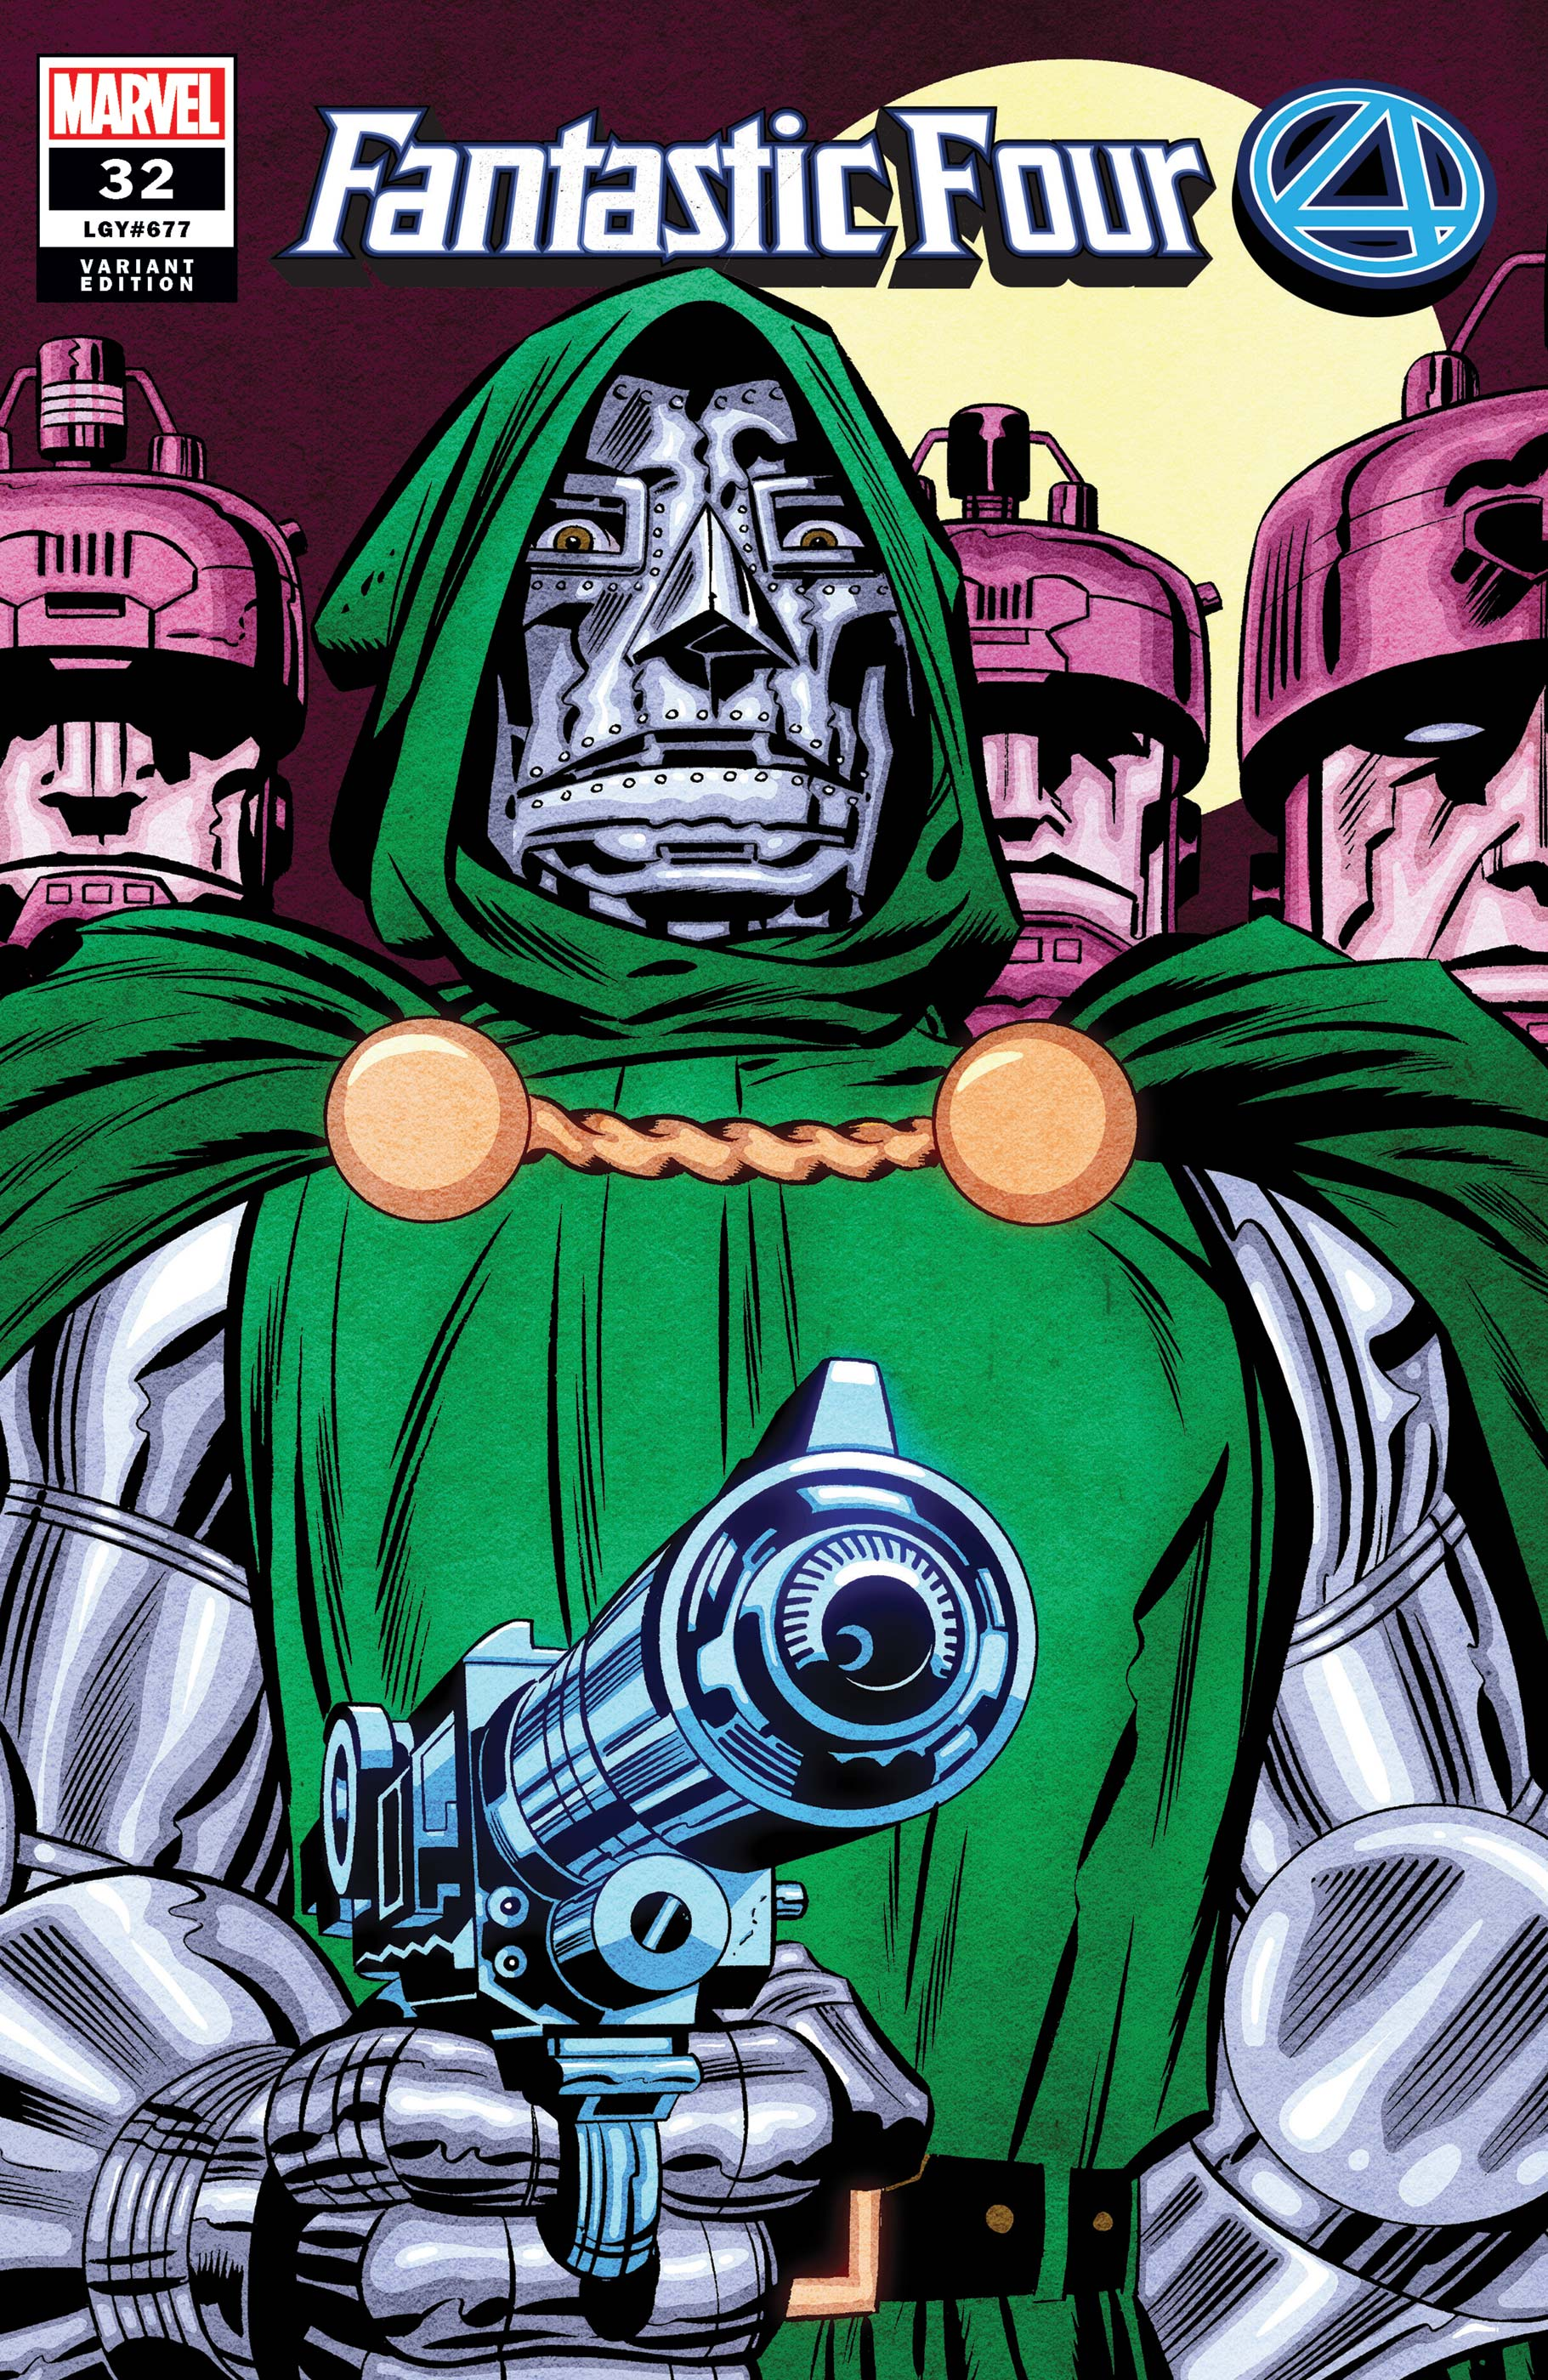 Fantastic Four (2018) #32 (Variant)